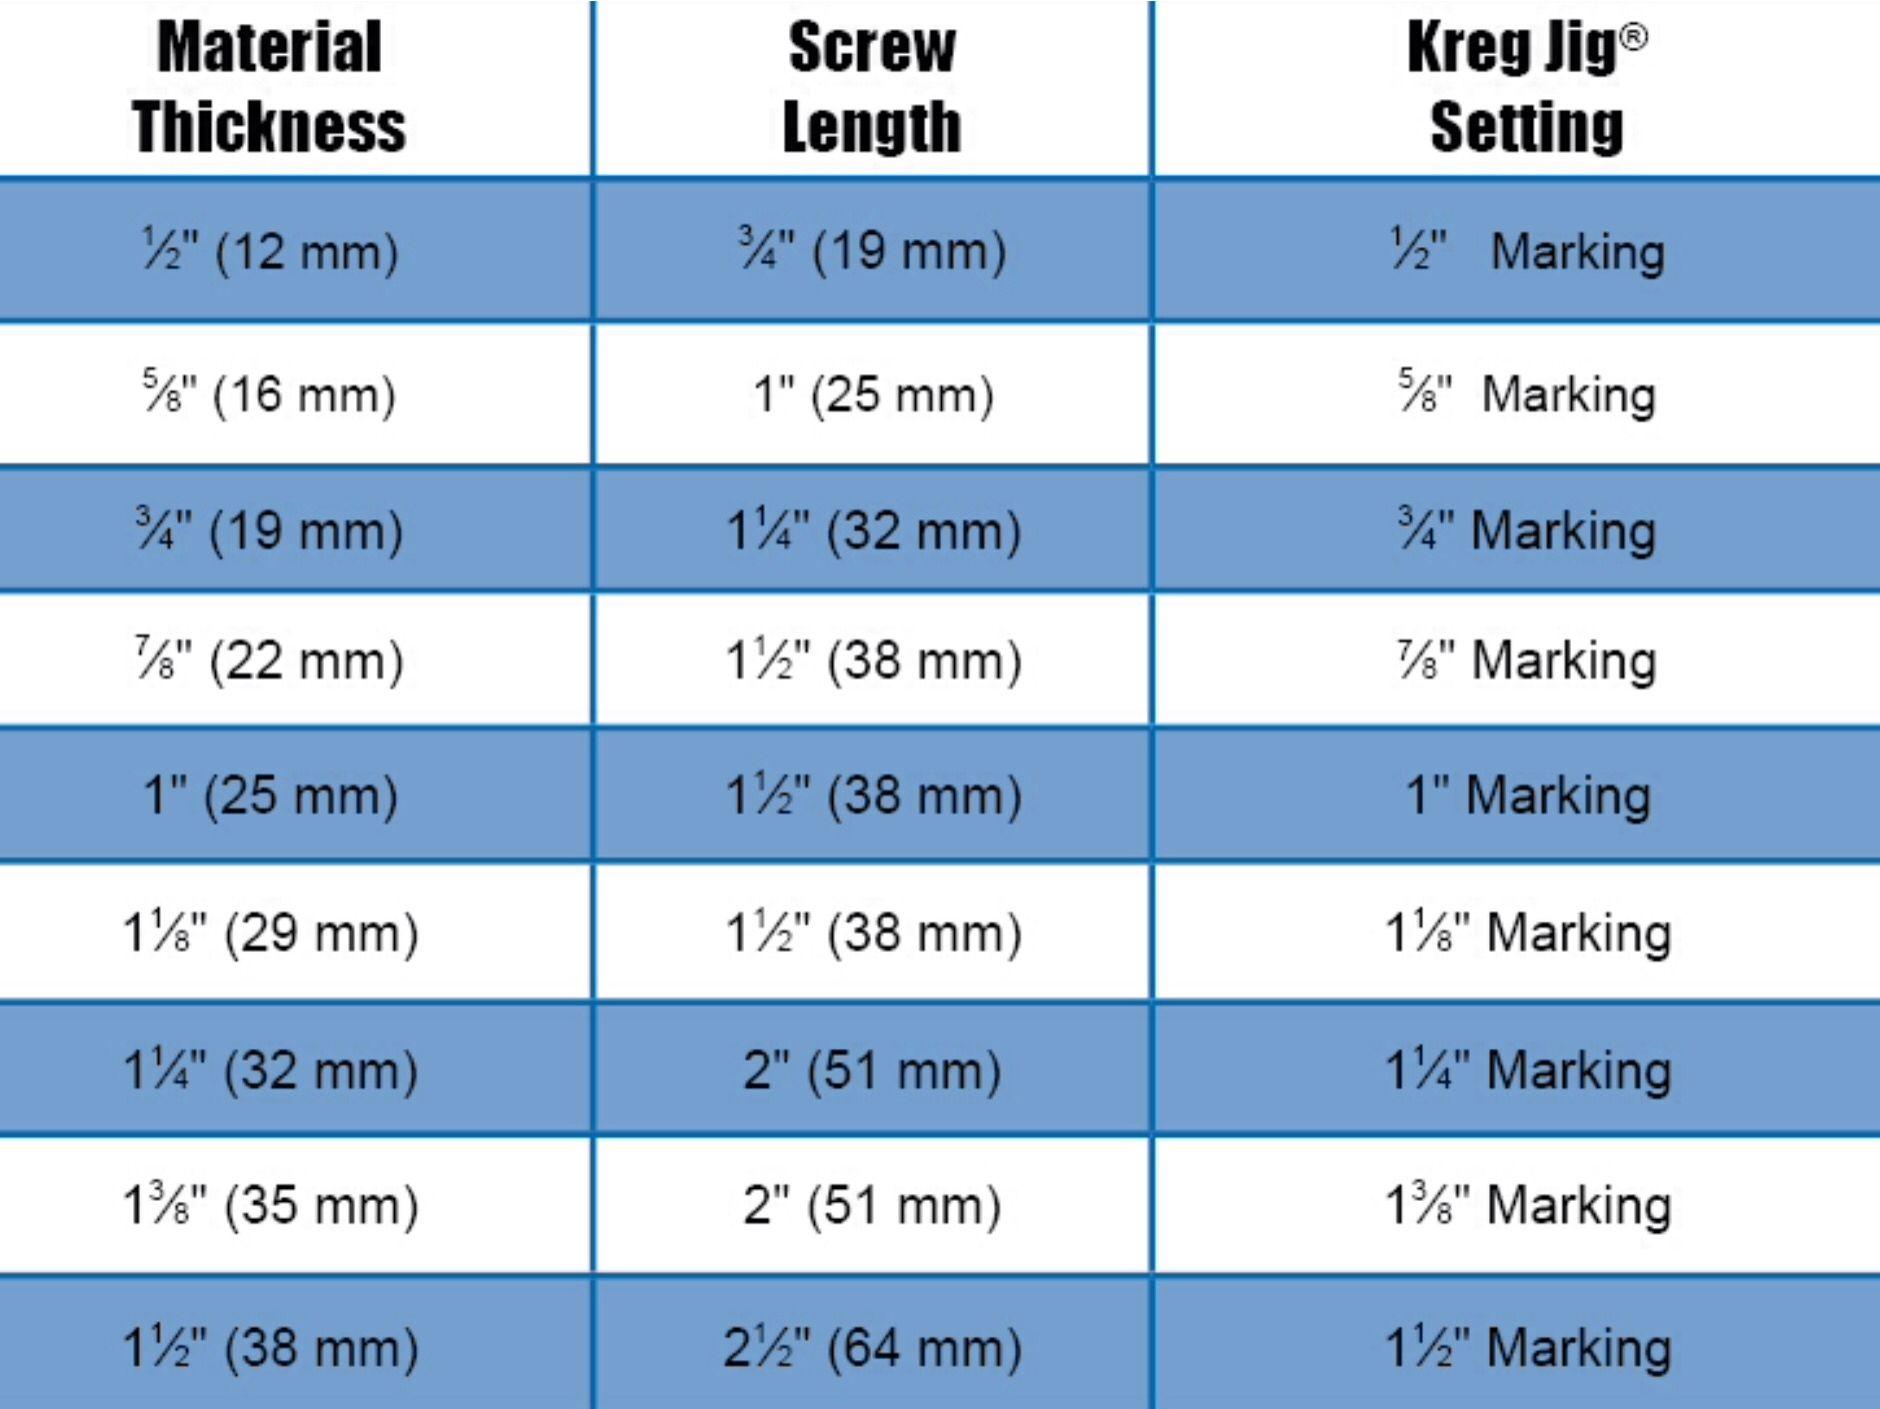 Wood Thickness Screw Size Kreg Jig Kreg Screws Woodworking Jigs